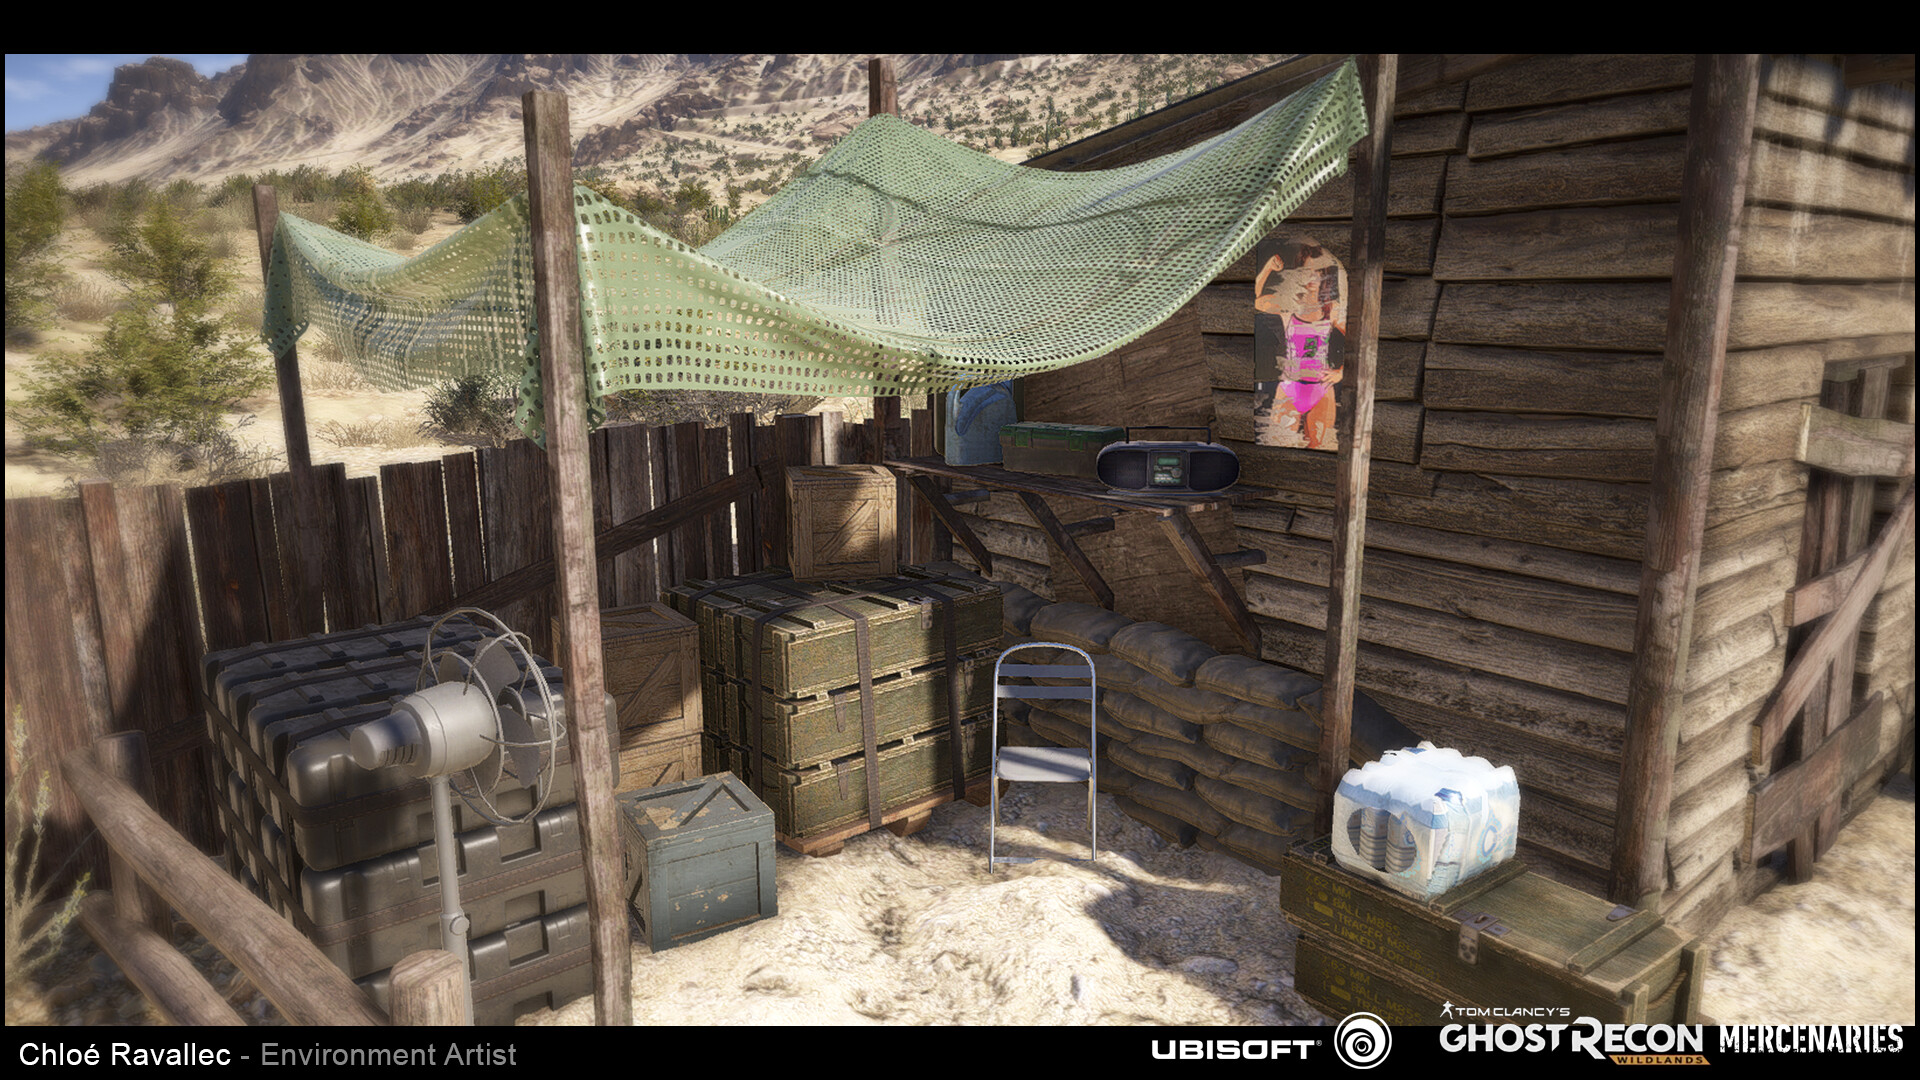 Chloe ravallec grwmercenaries 06